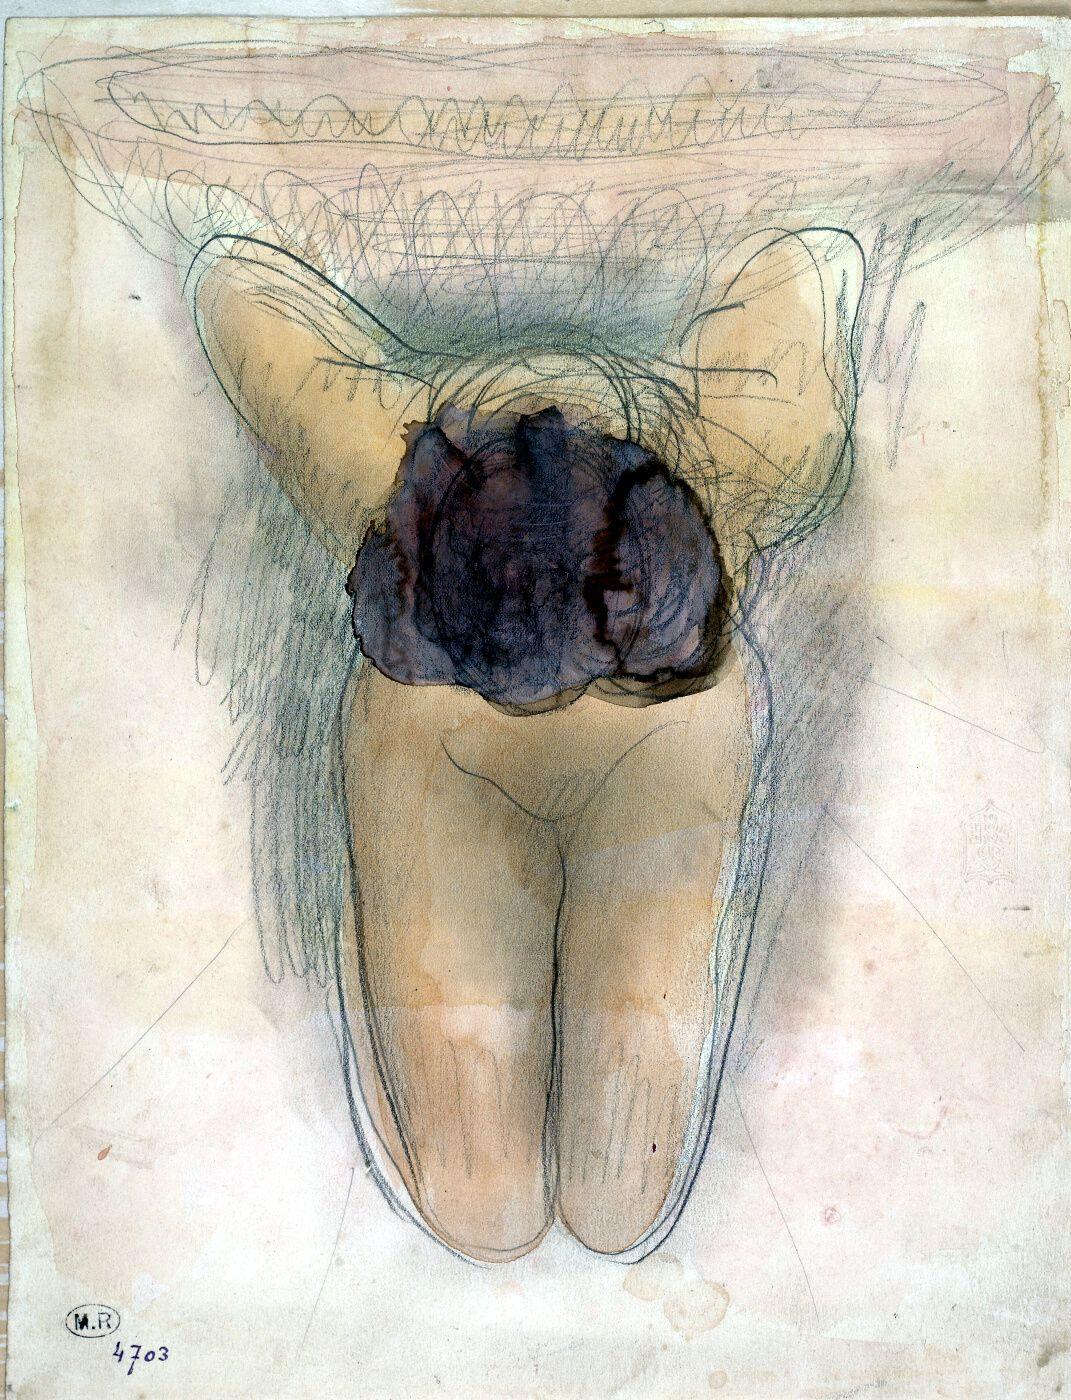 Mujer desnuda arrodillada, de frente inclinada